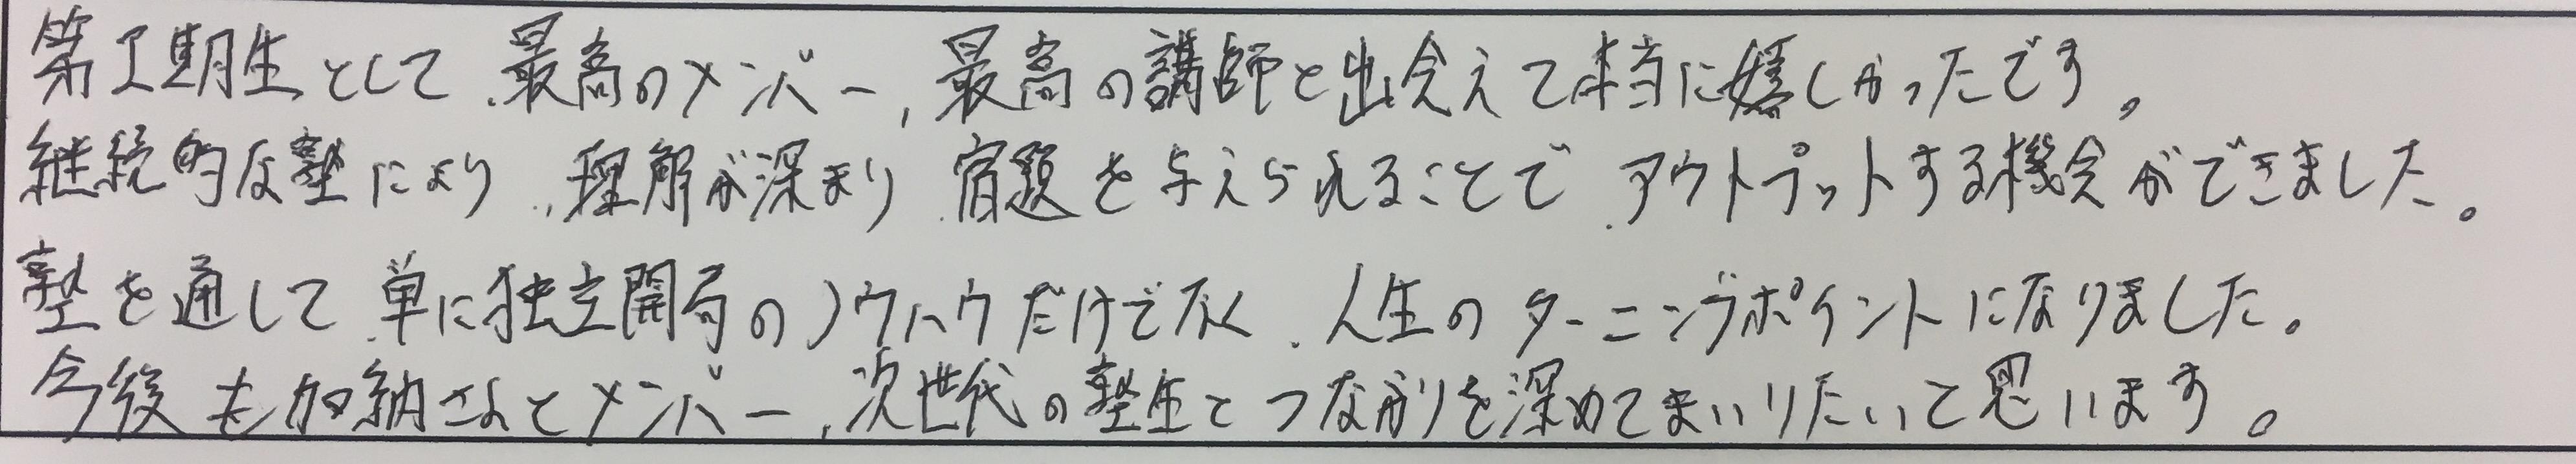 写真 2017-03-18 12 18 52